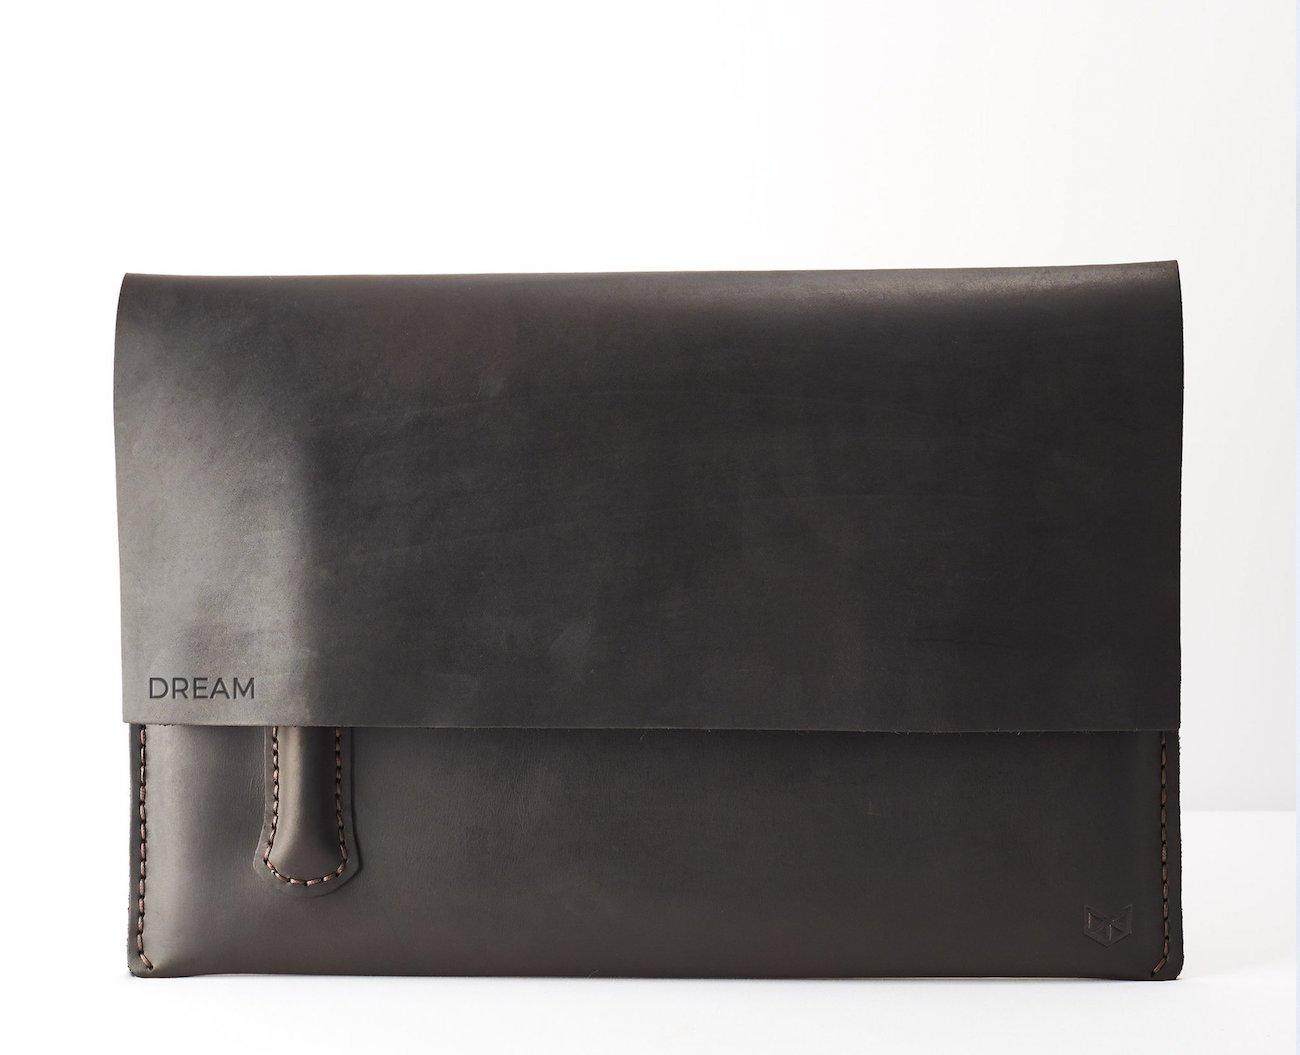 Marron Draftsman 2 Leather iPad Case